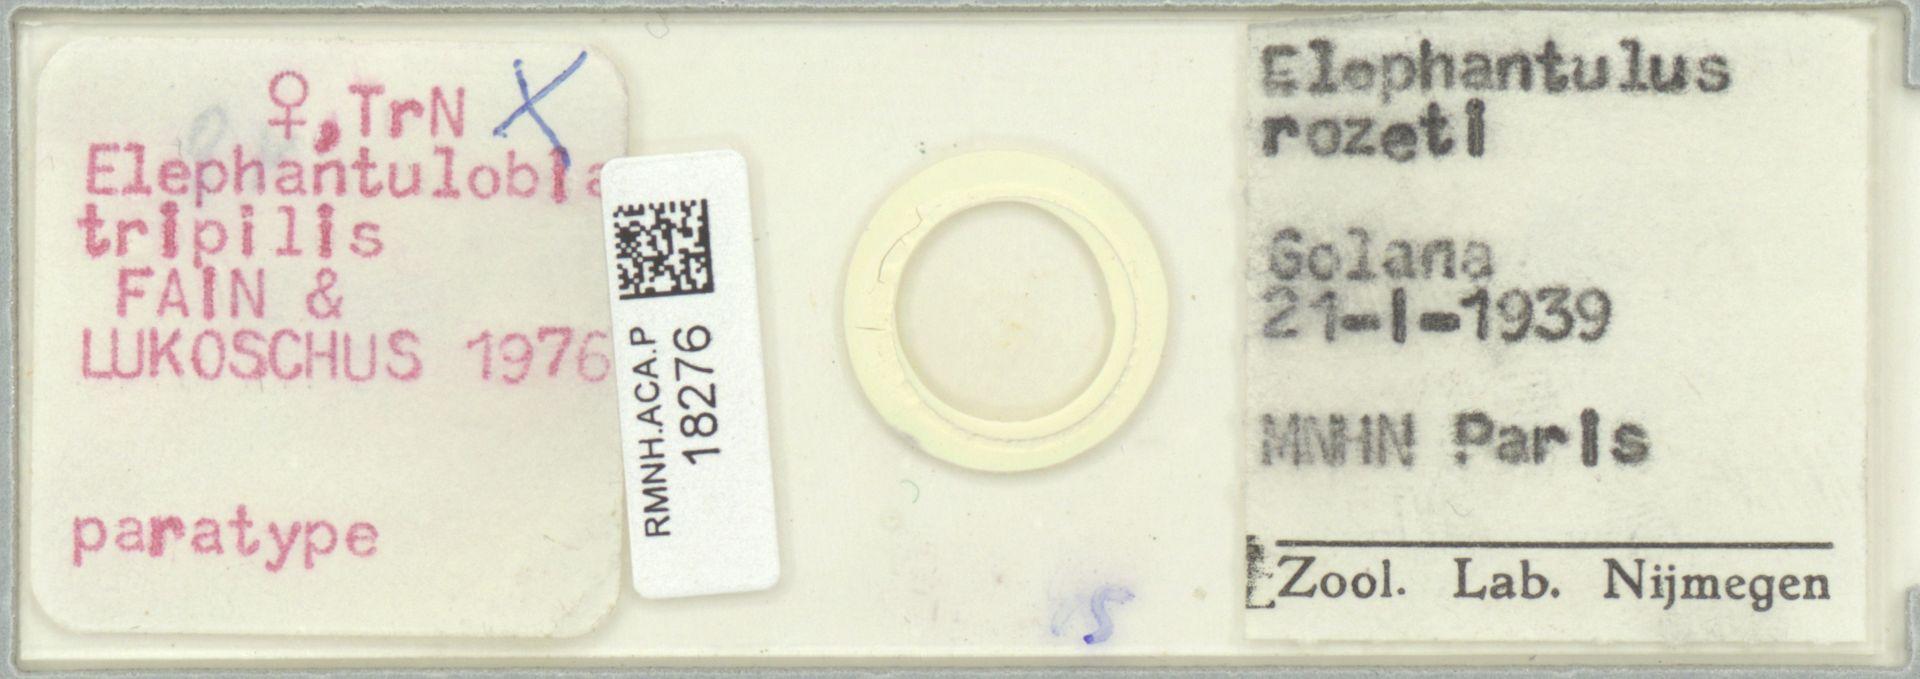 RMNH.ACA.P.18276 | Elephantulobia tripilis Fain & Lukoschus, 1976